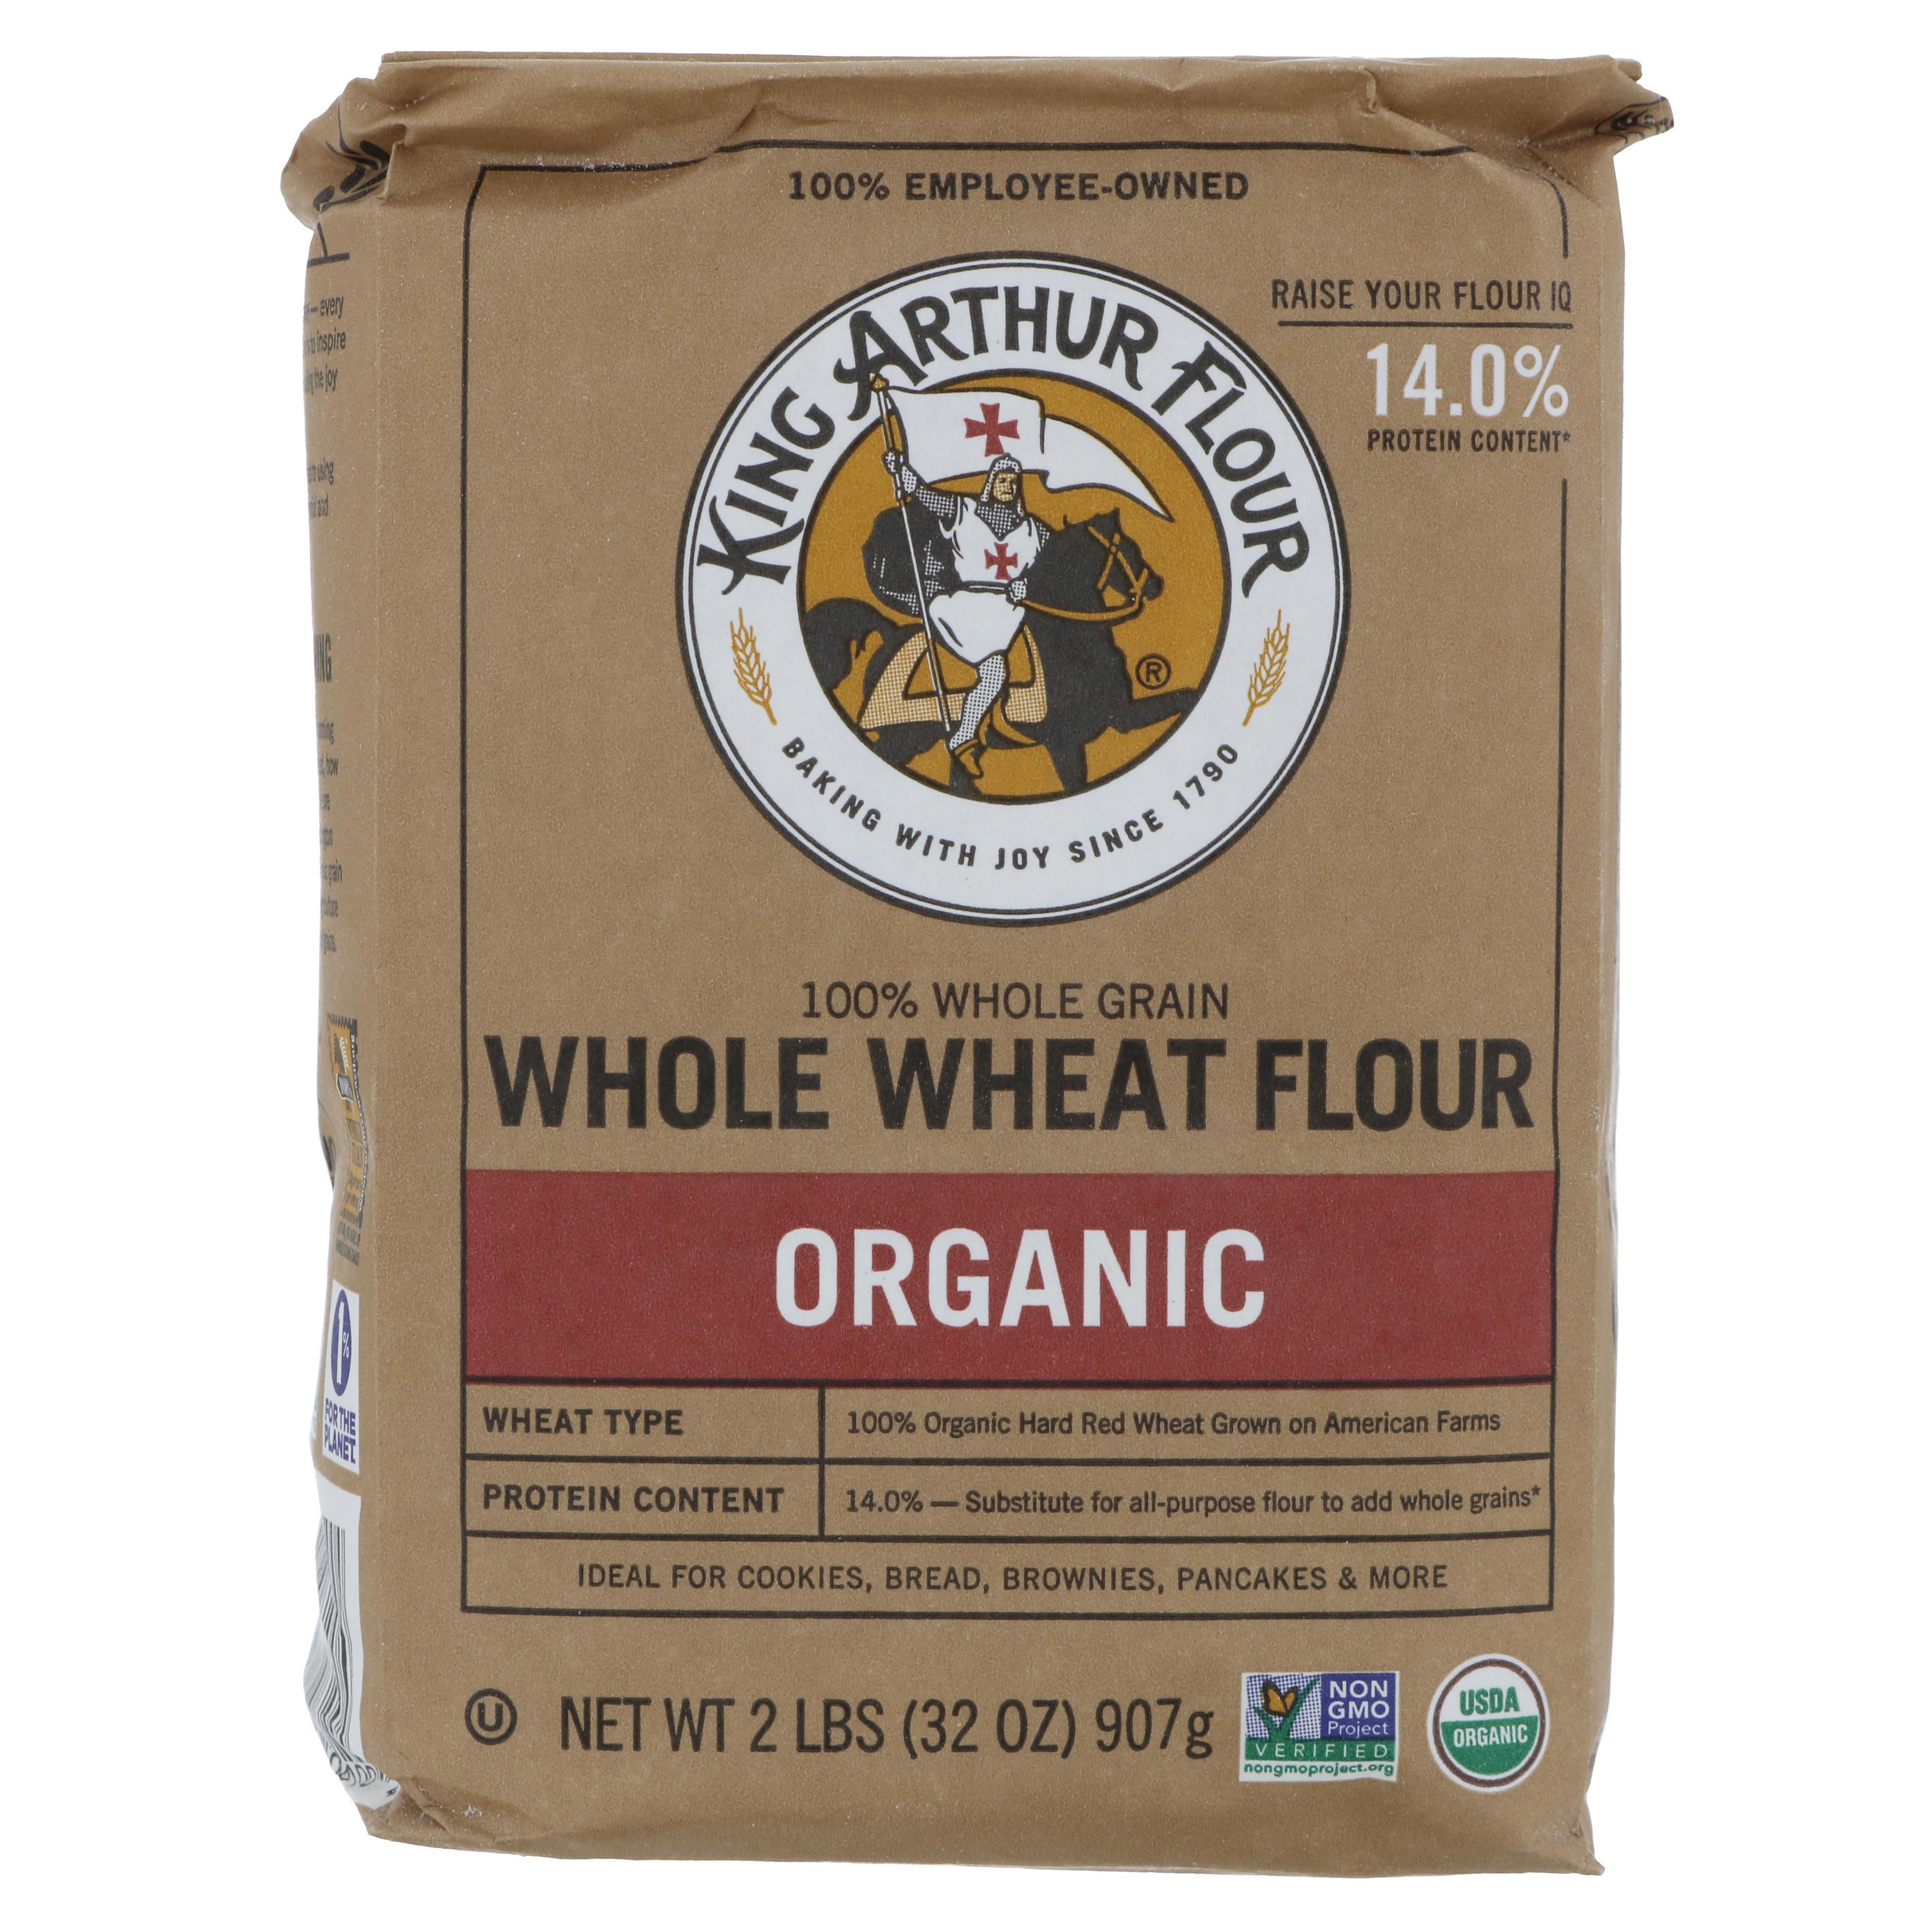 King Arthur Unbleached Organic Whole